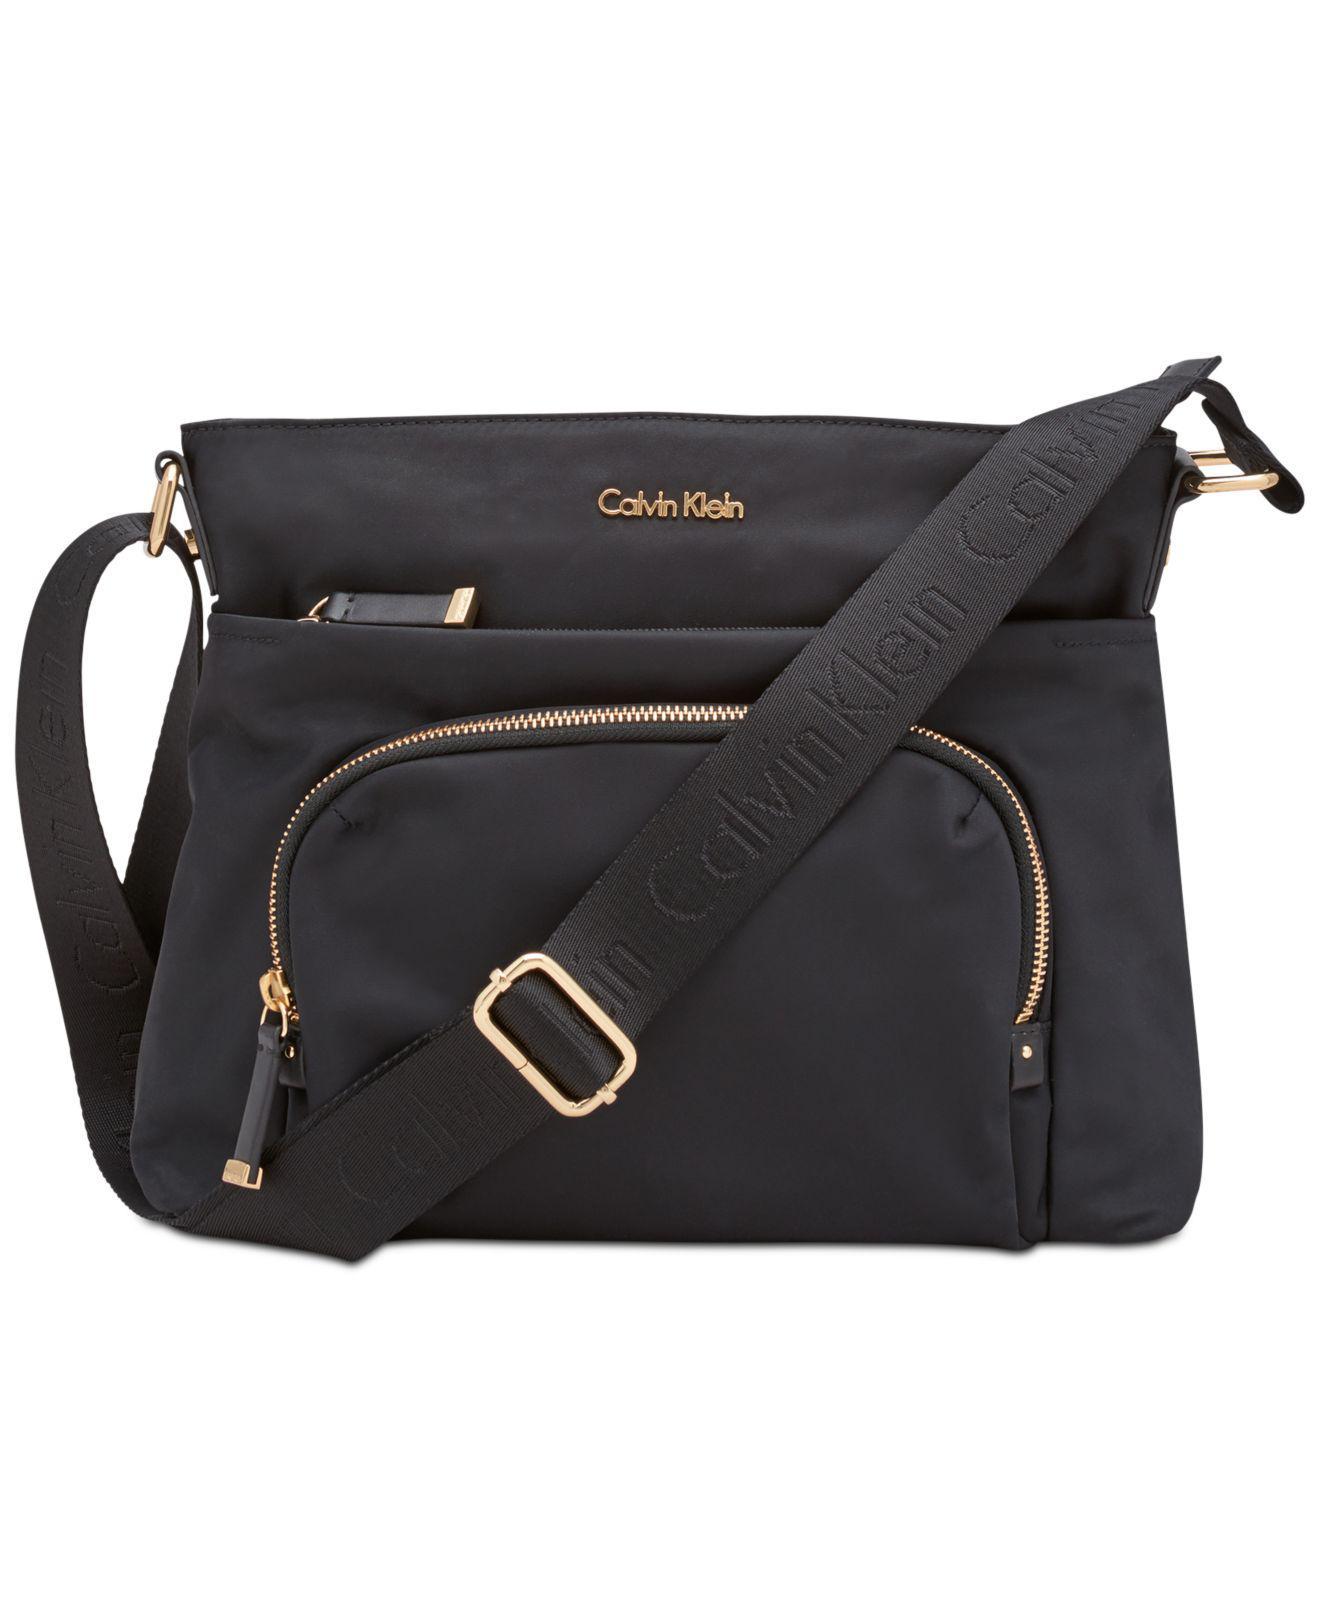 Image result for calvin klein vanessa small crossbody handbag #crossbody #calvinklein #bag